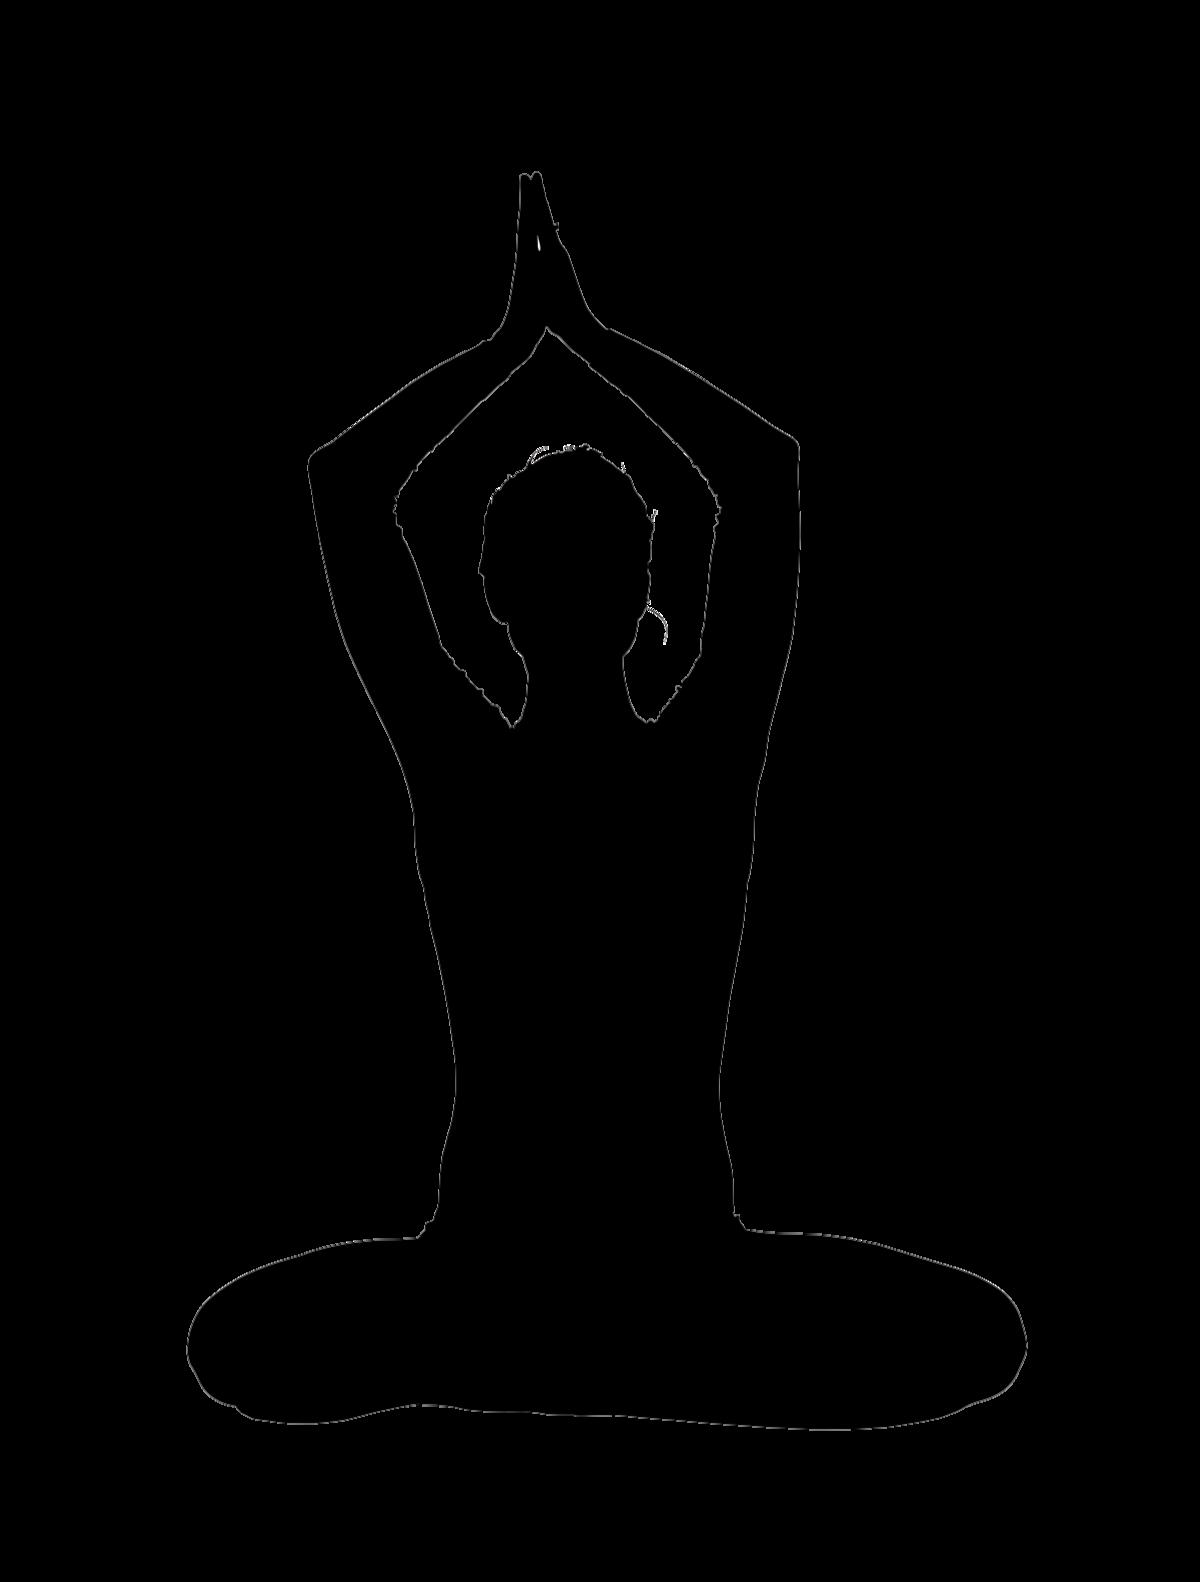 Moksha - Wikiquote